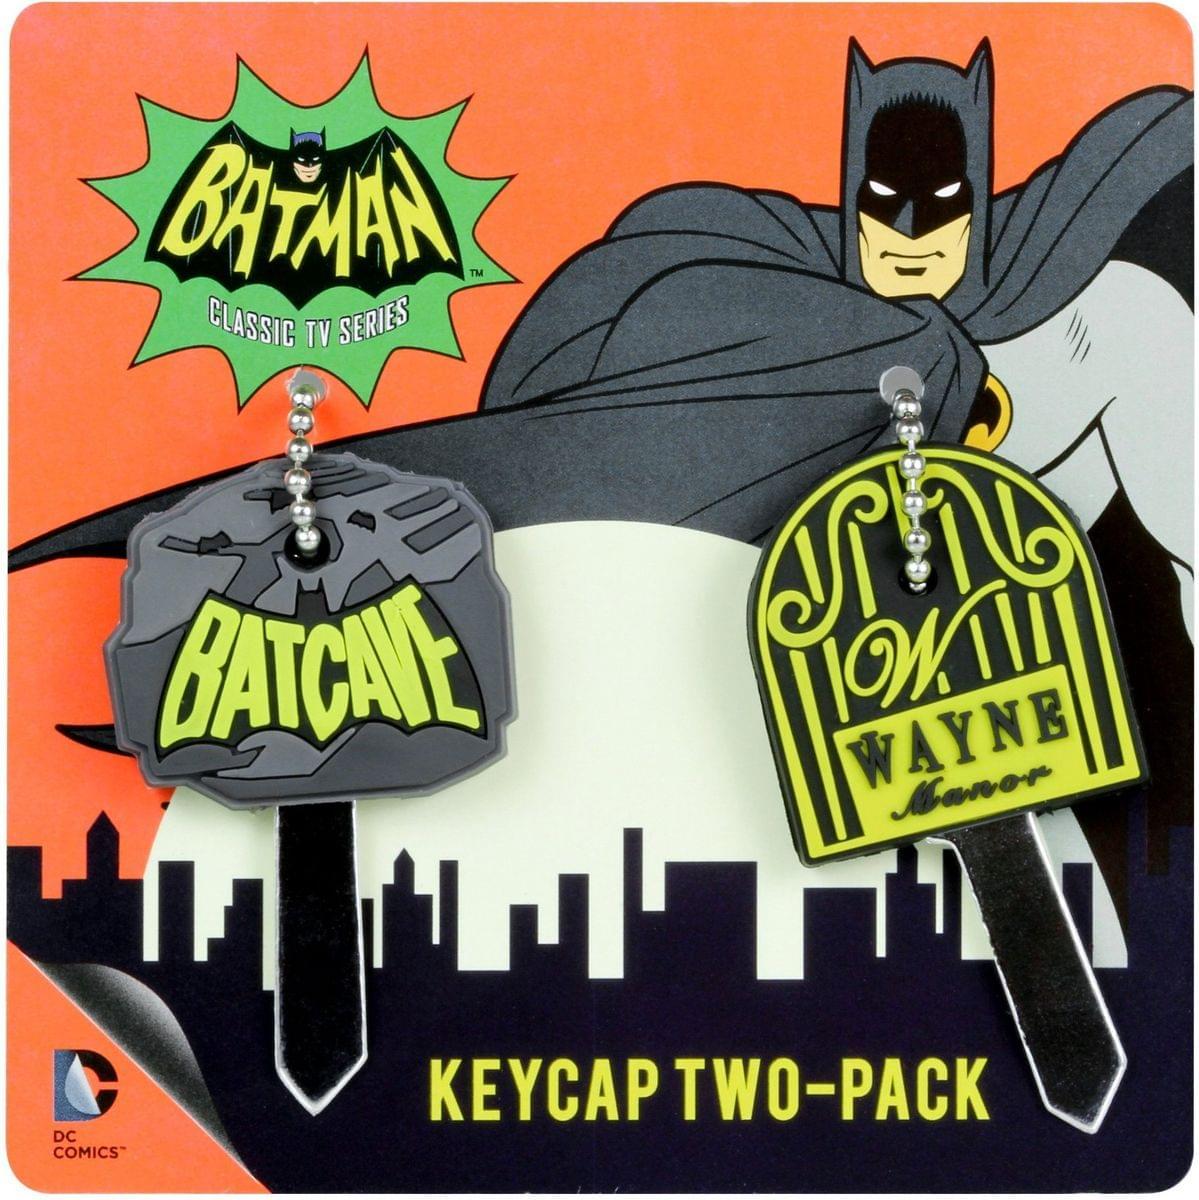 Batman Classic TV Series Keycap 2-Pack